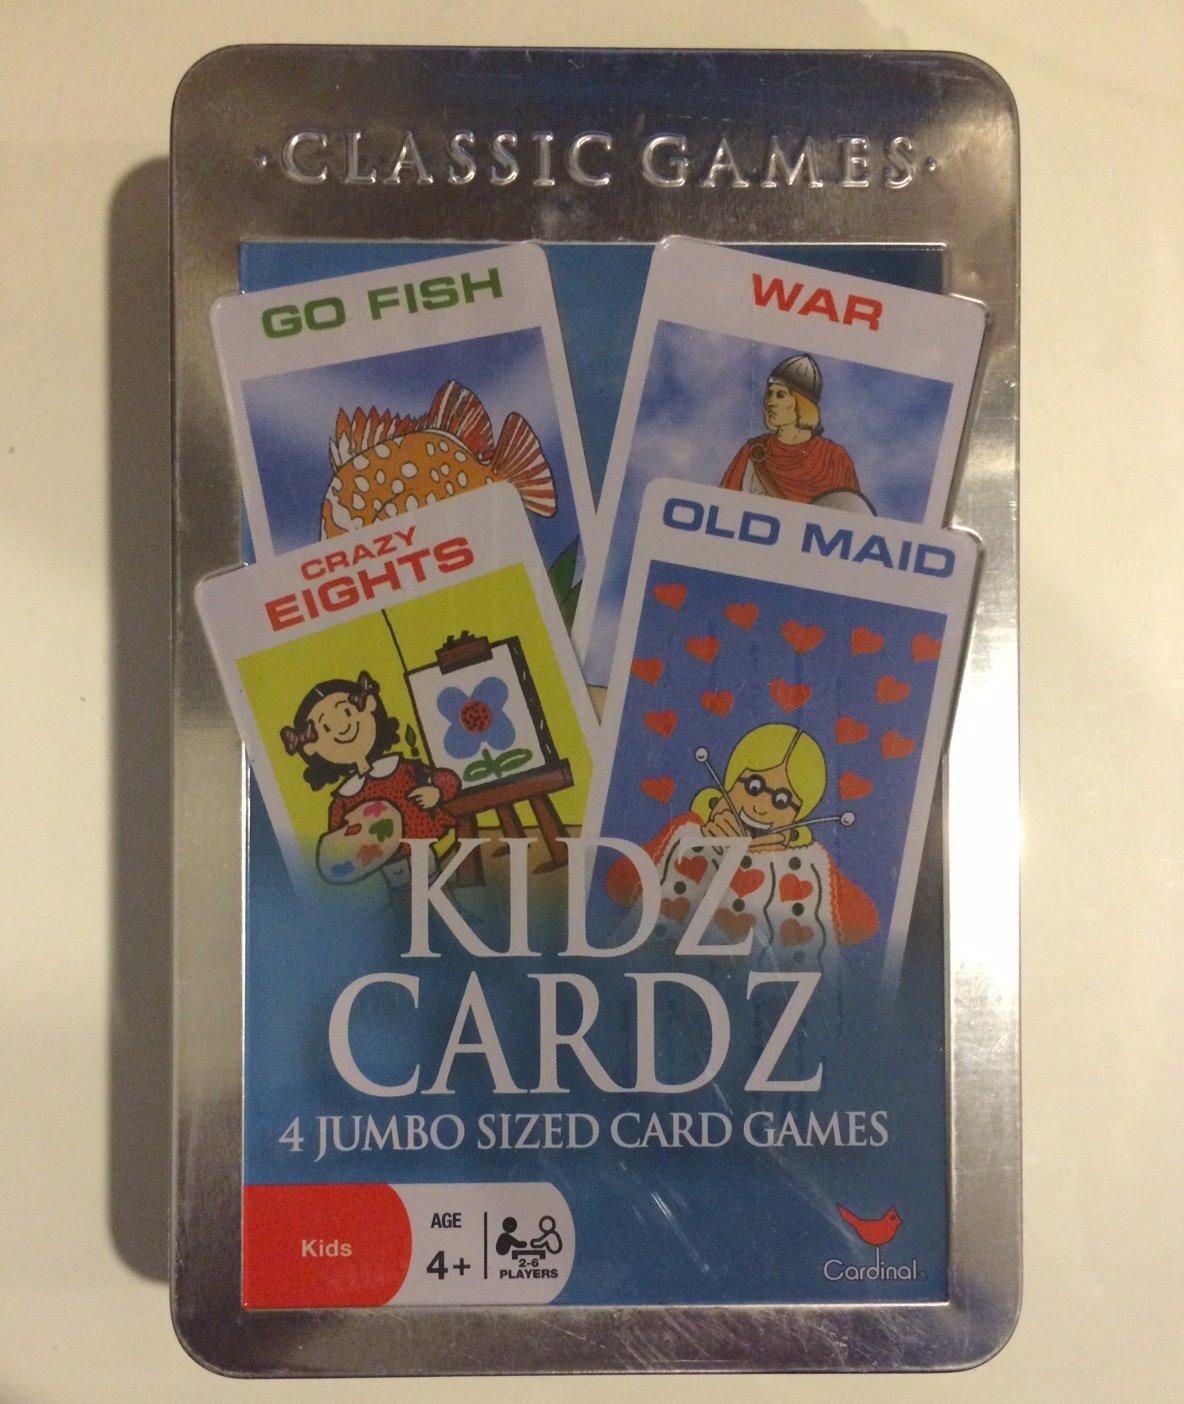 Kidz Cardz 4 Jumbo Größed Card Games by Go Go Go Fish - War - Crazy Eights - Old Maid 77618d